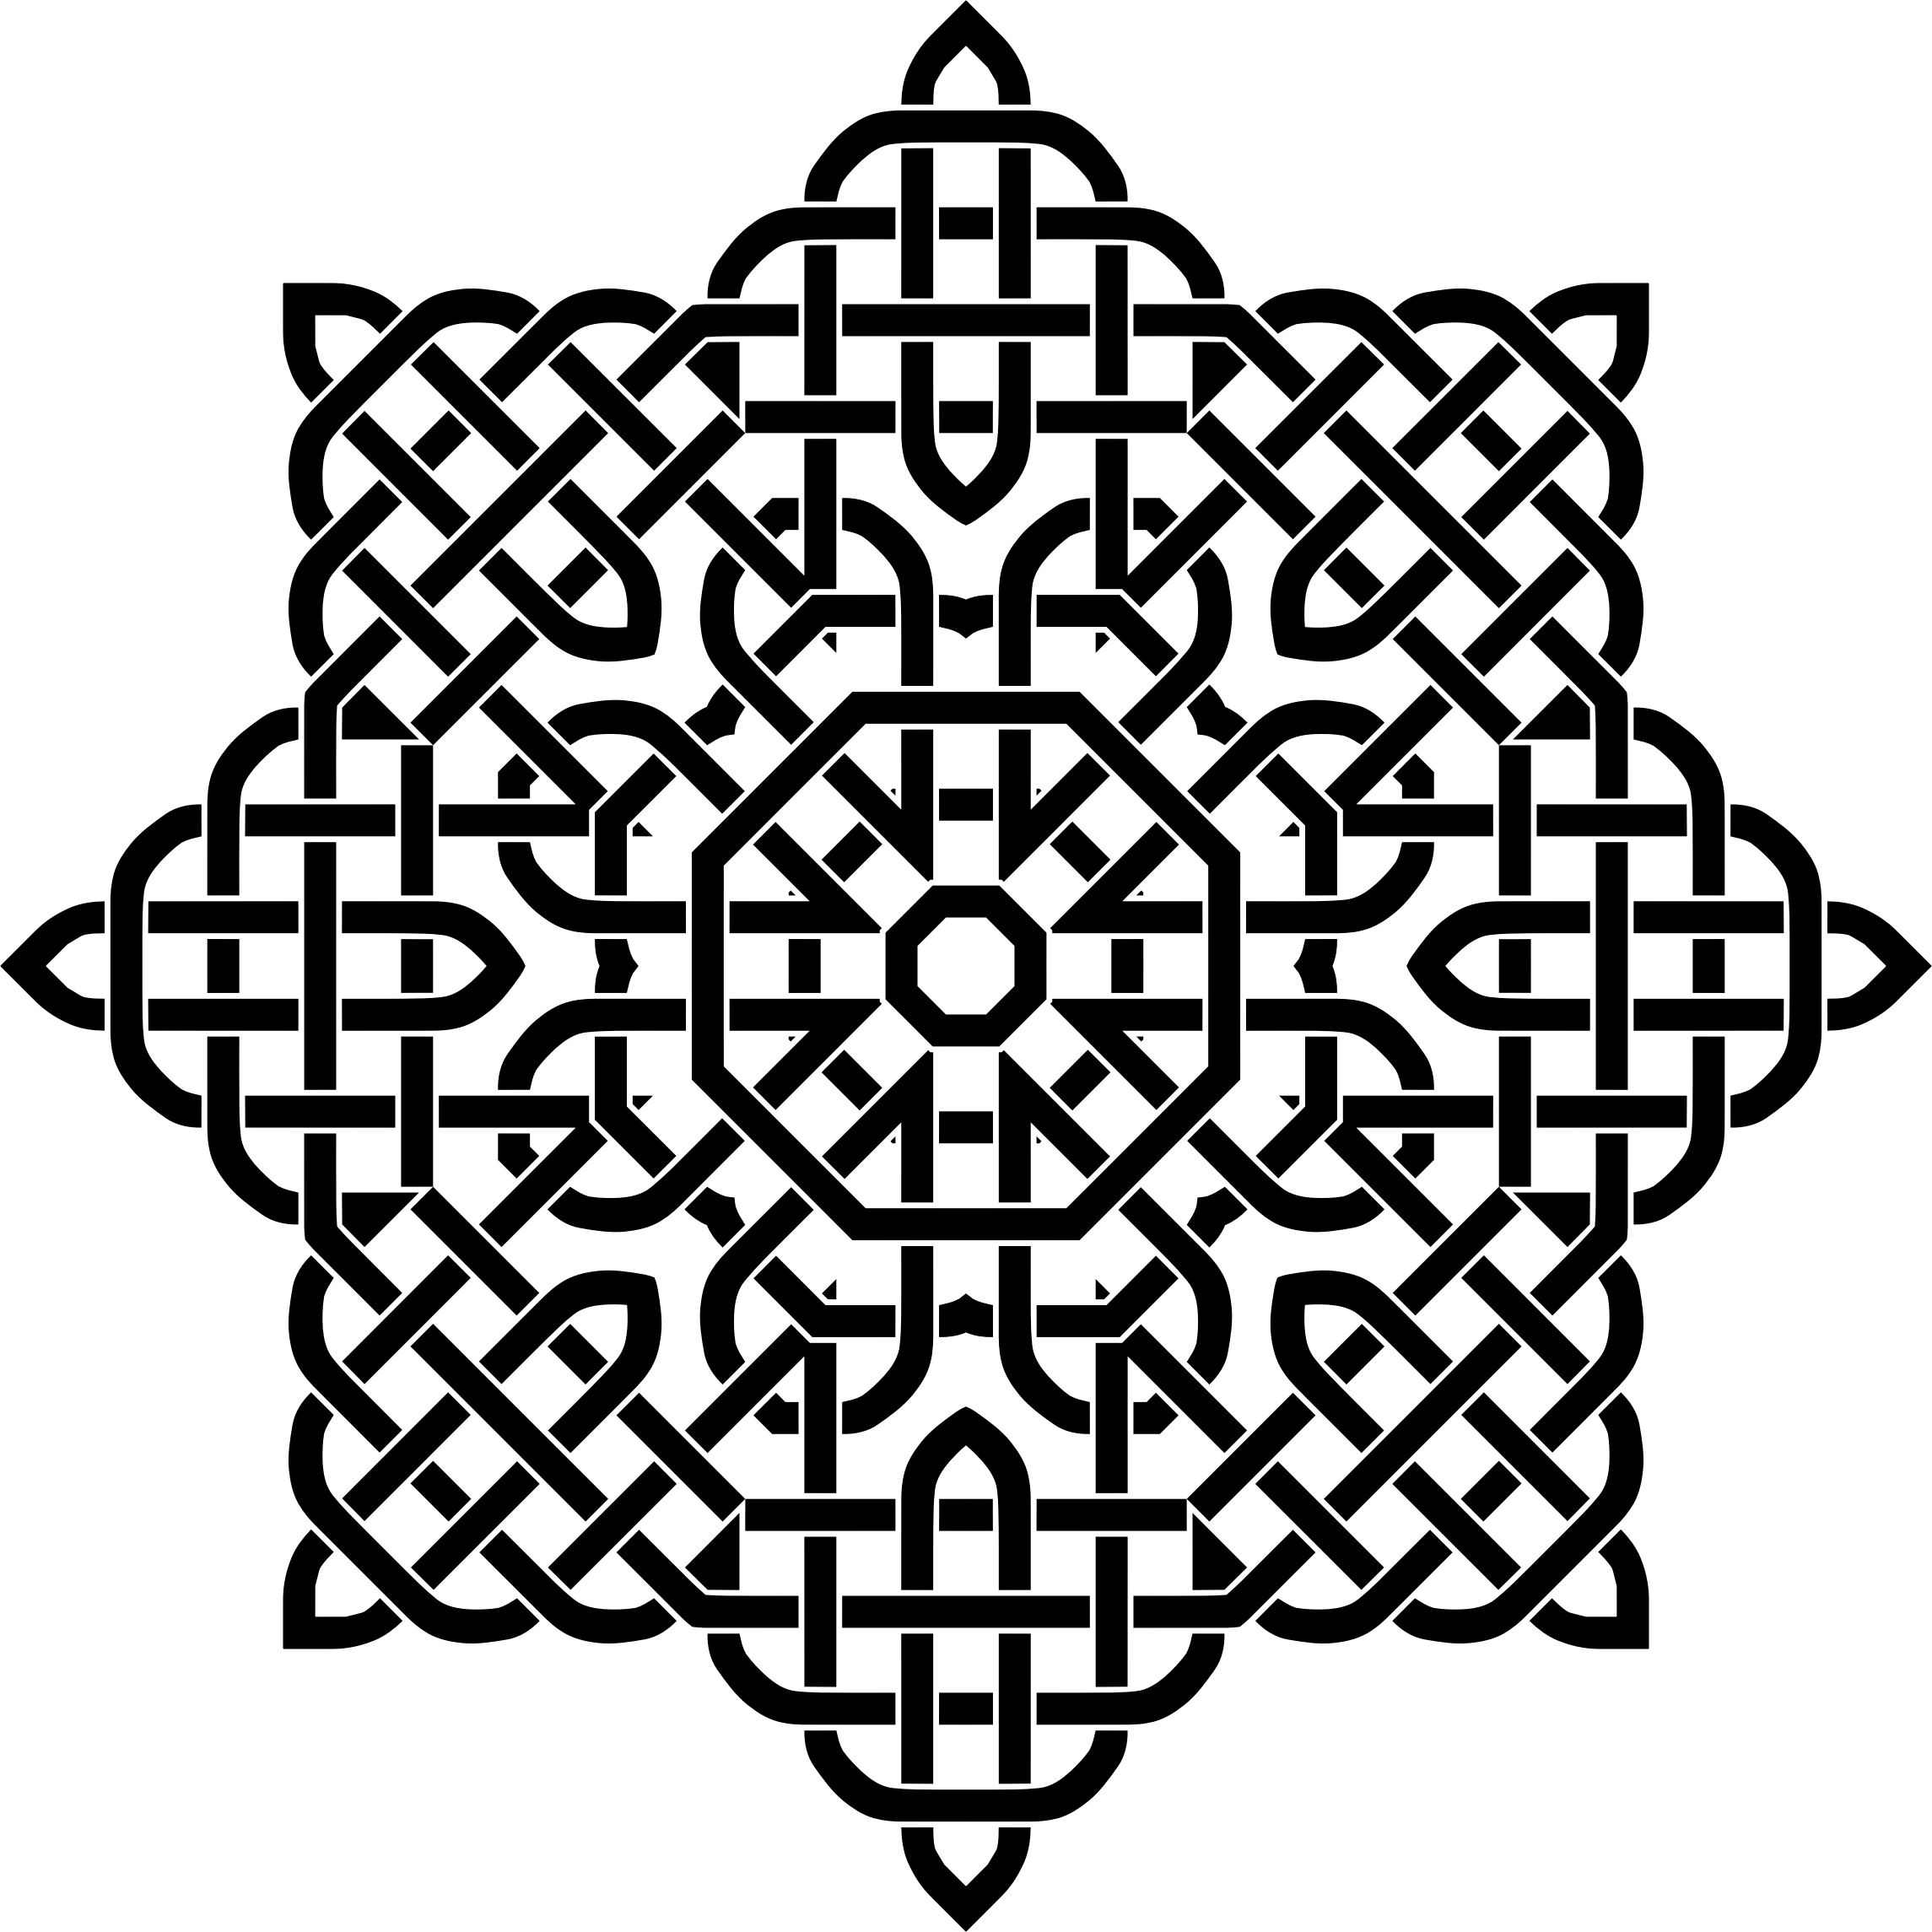 Mandala black and white